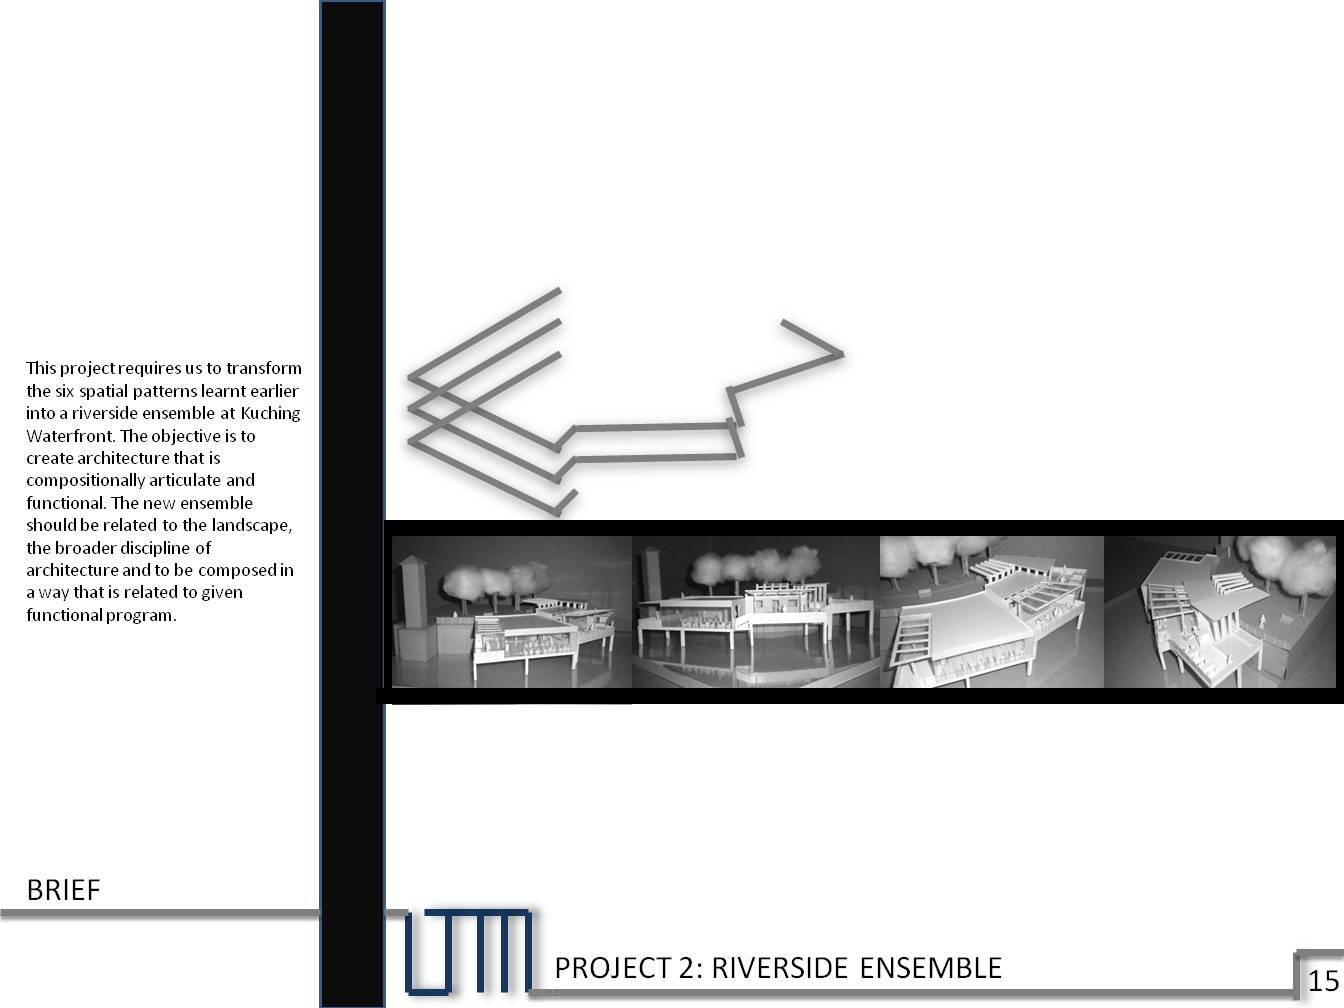 Architecture Portfolio 13-14 | Flickr - Photo Sharing!